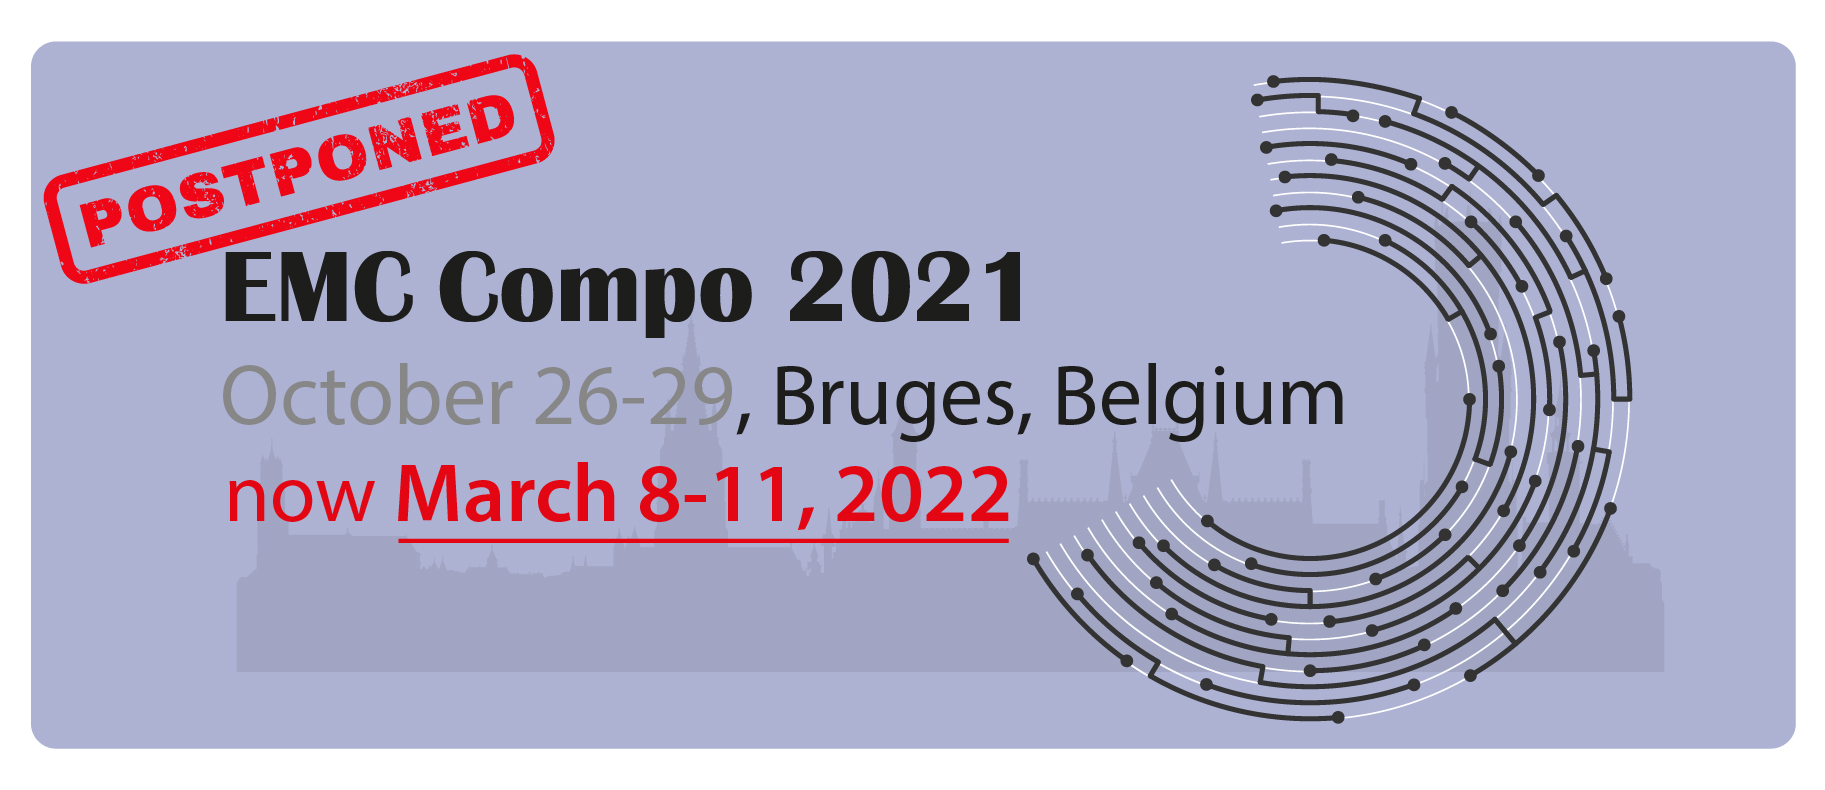 EMC Compo 2021